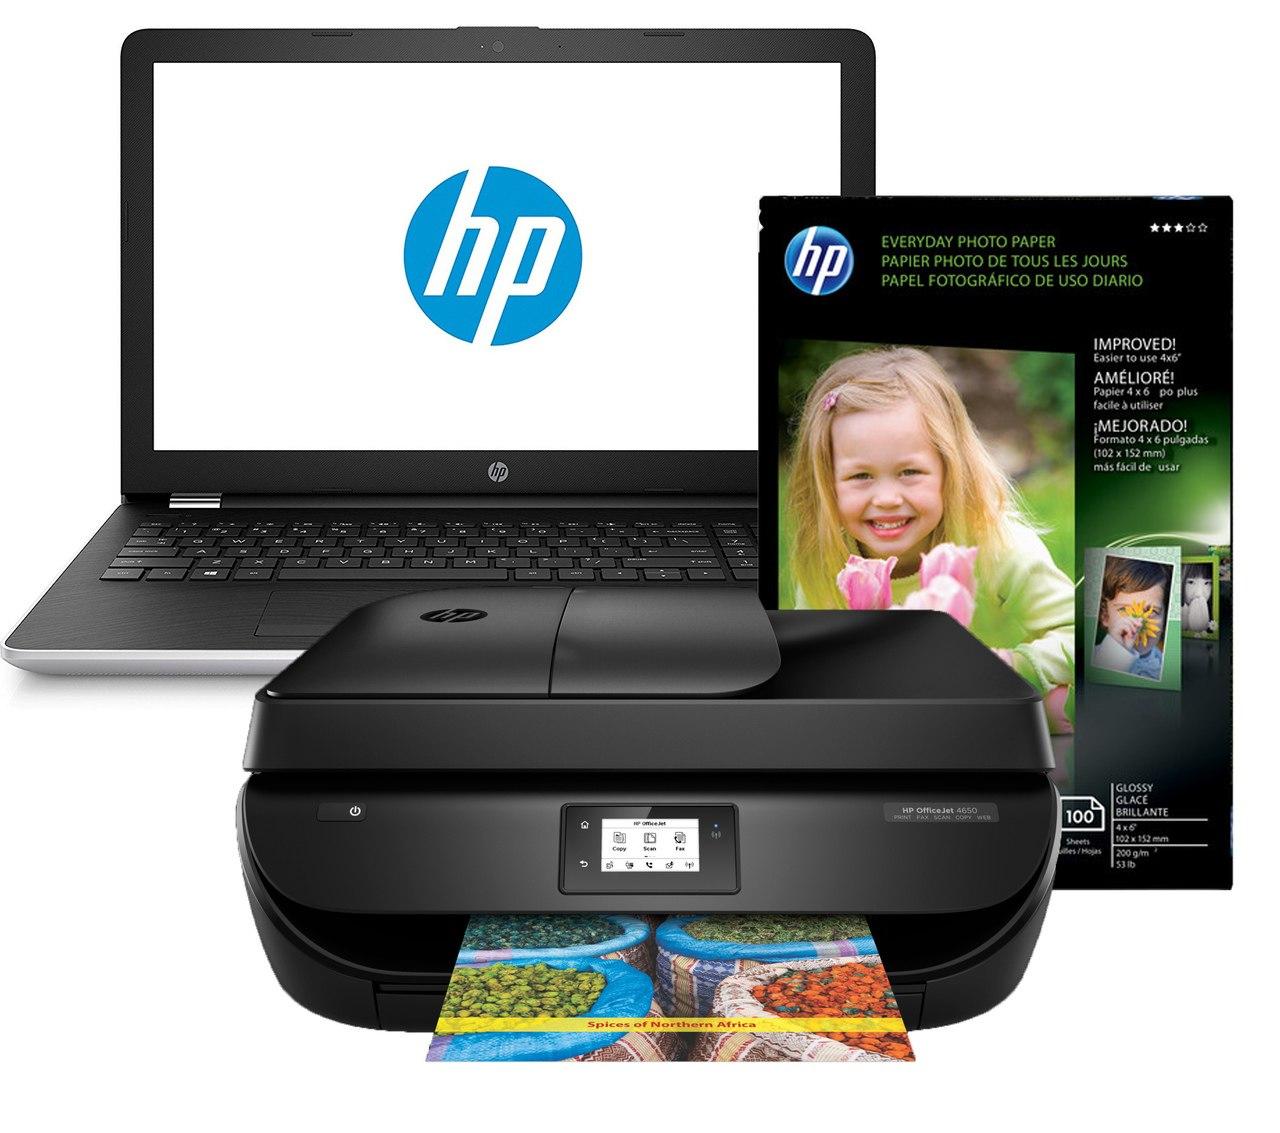 HP 4650 Printer and HP Notebook 1VK25UA Bundle (Refurbished) - $299.85 + Free Shipping